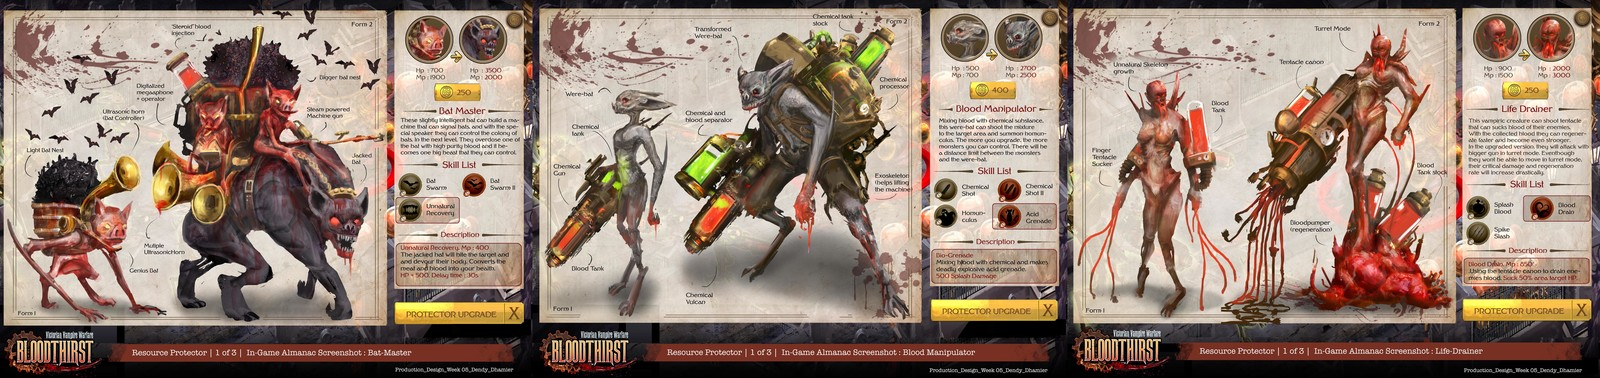 Vampiric creature designs and skills.